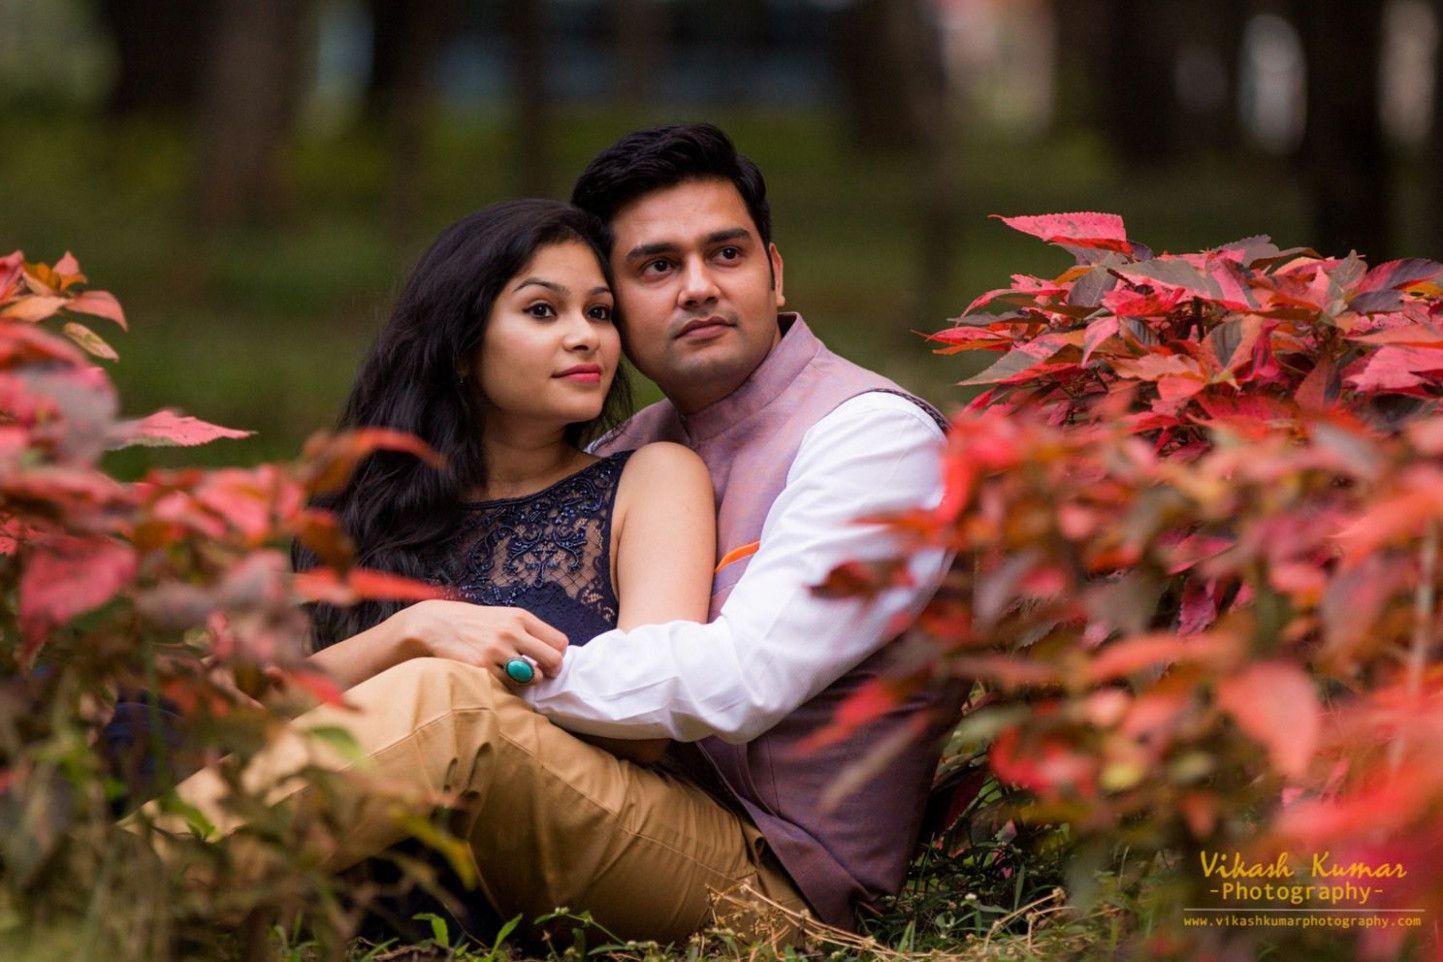 Indian Wedding Photography Engagement Shoots Pre Wedding Photoshoot Outdoor Wedding Photoshoot Poses Pre Wedding Photoshoot